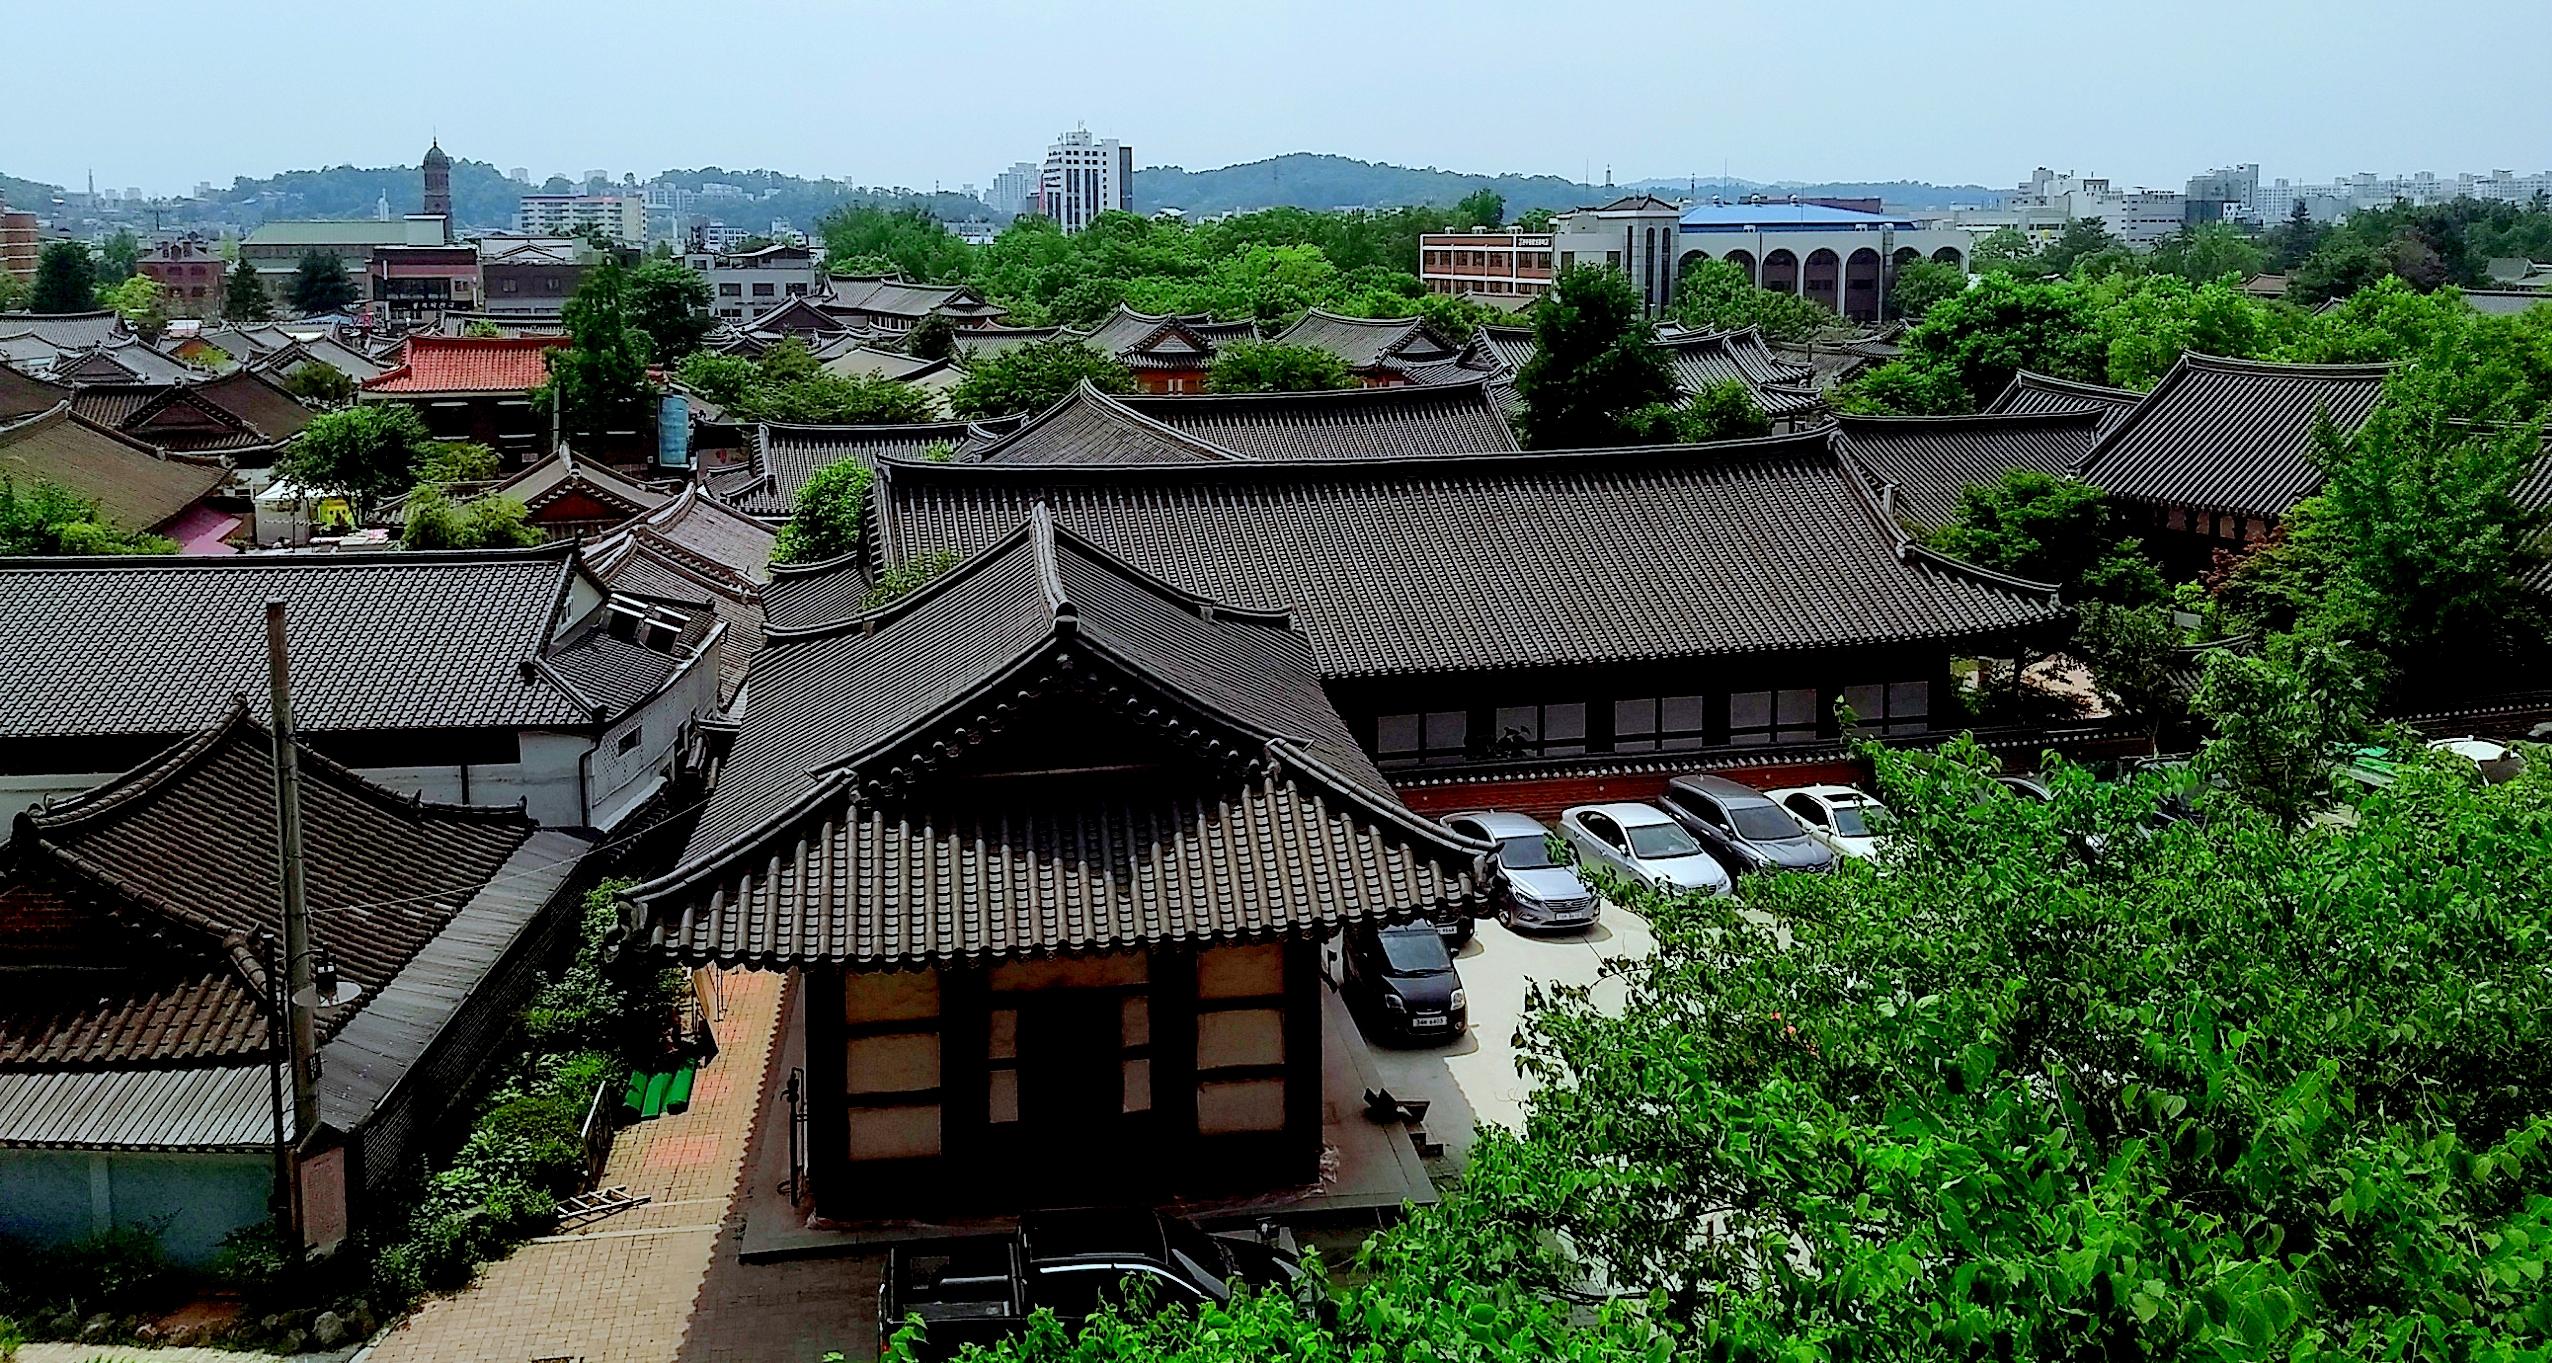 A village in Korea